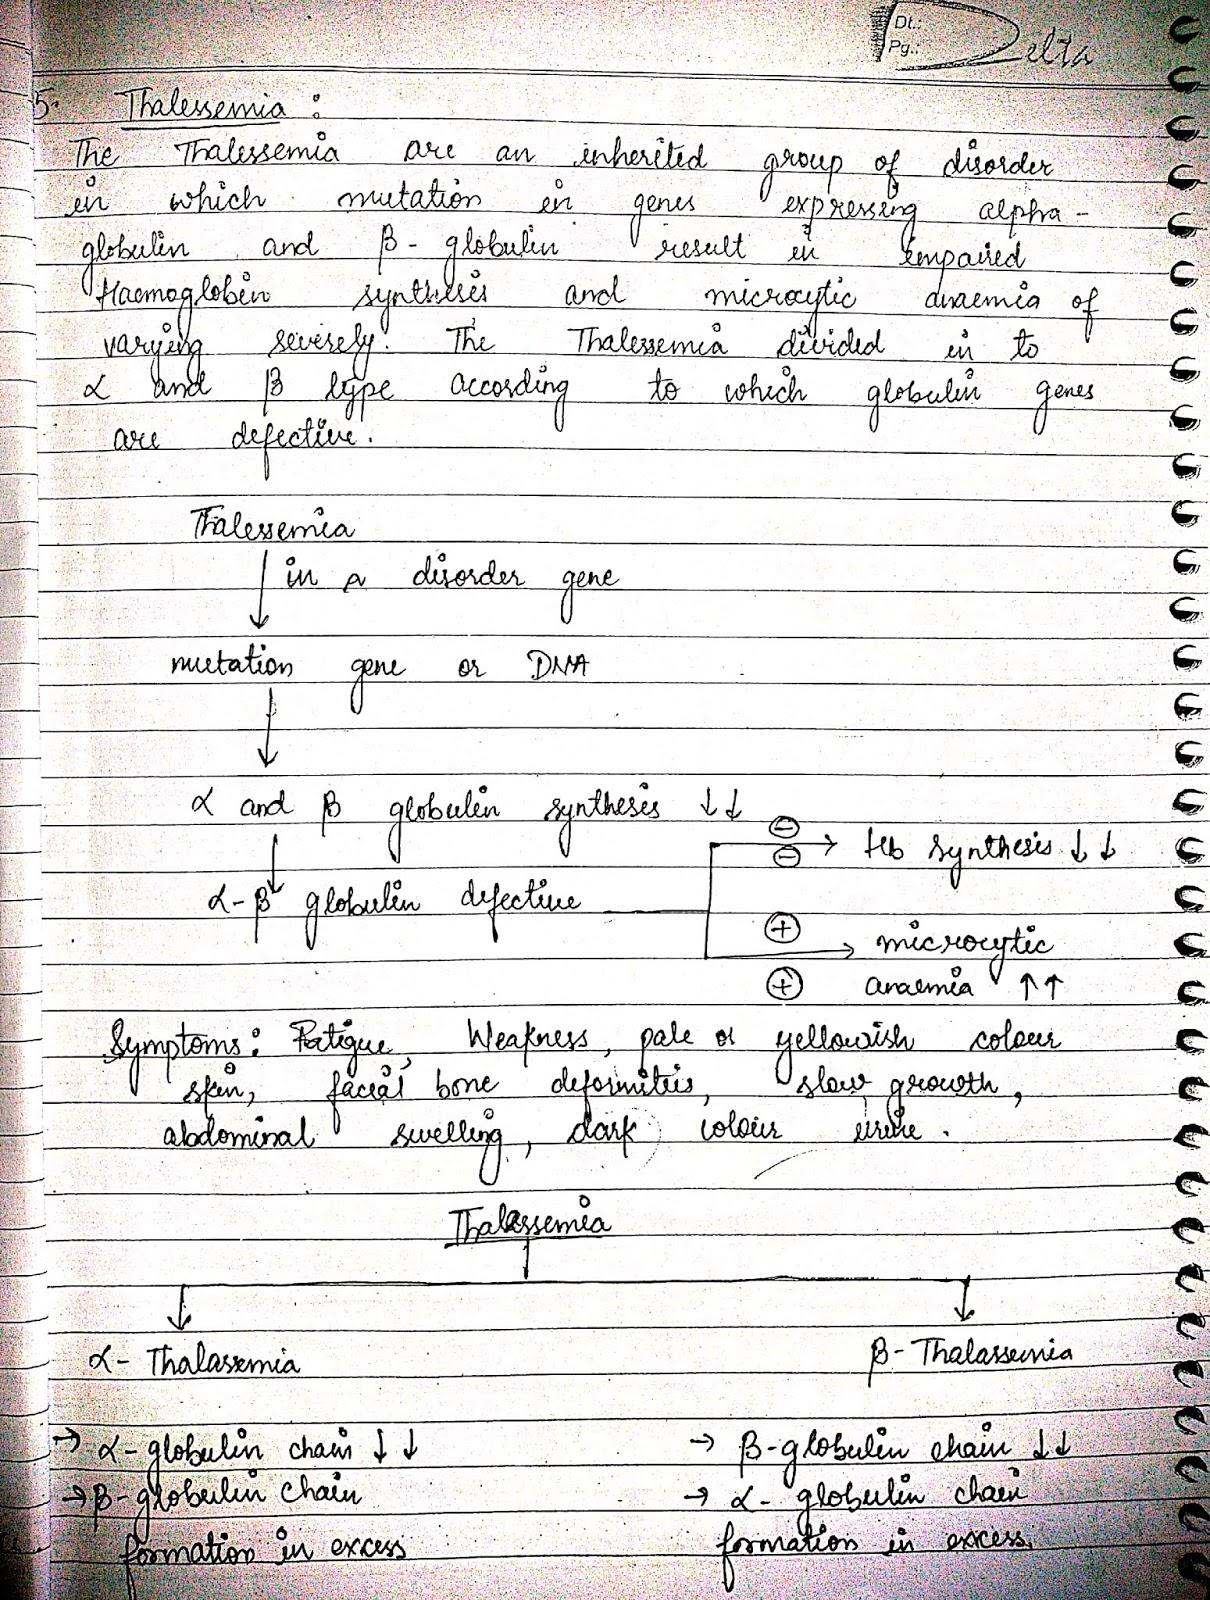 Pathophysiology - Anemia